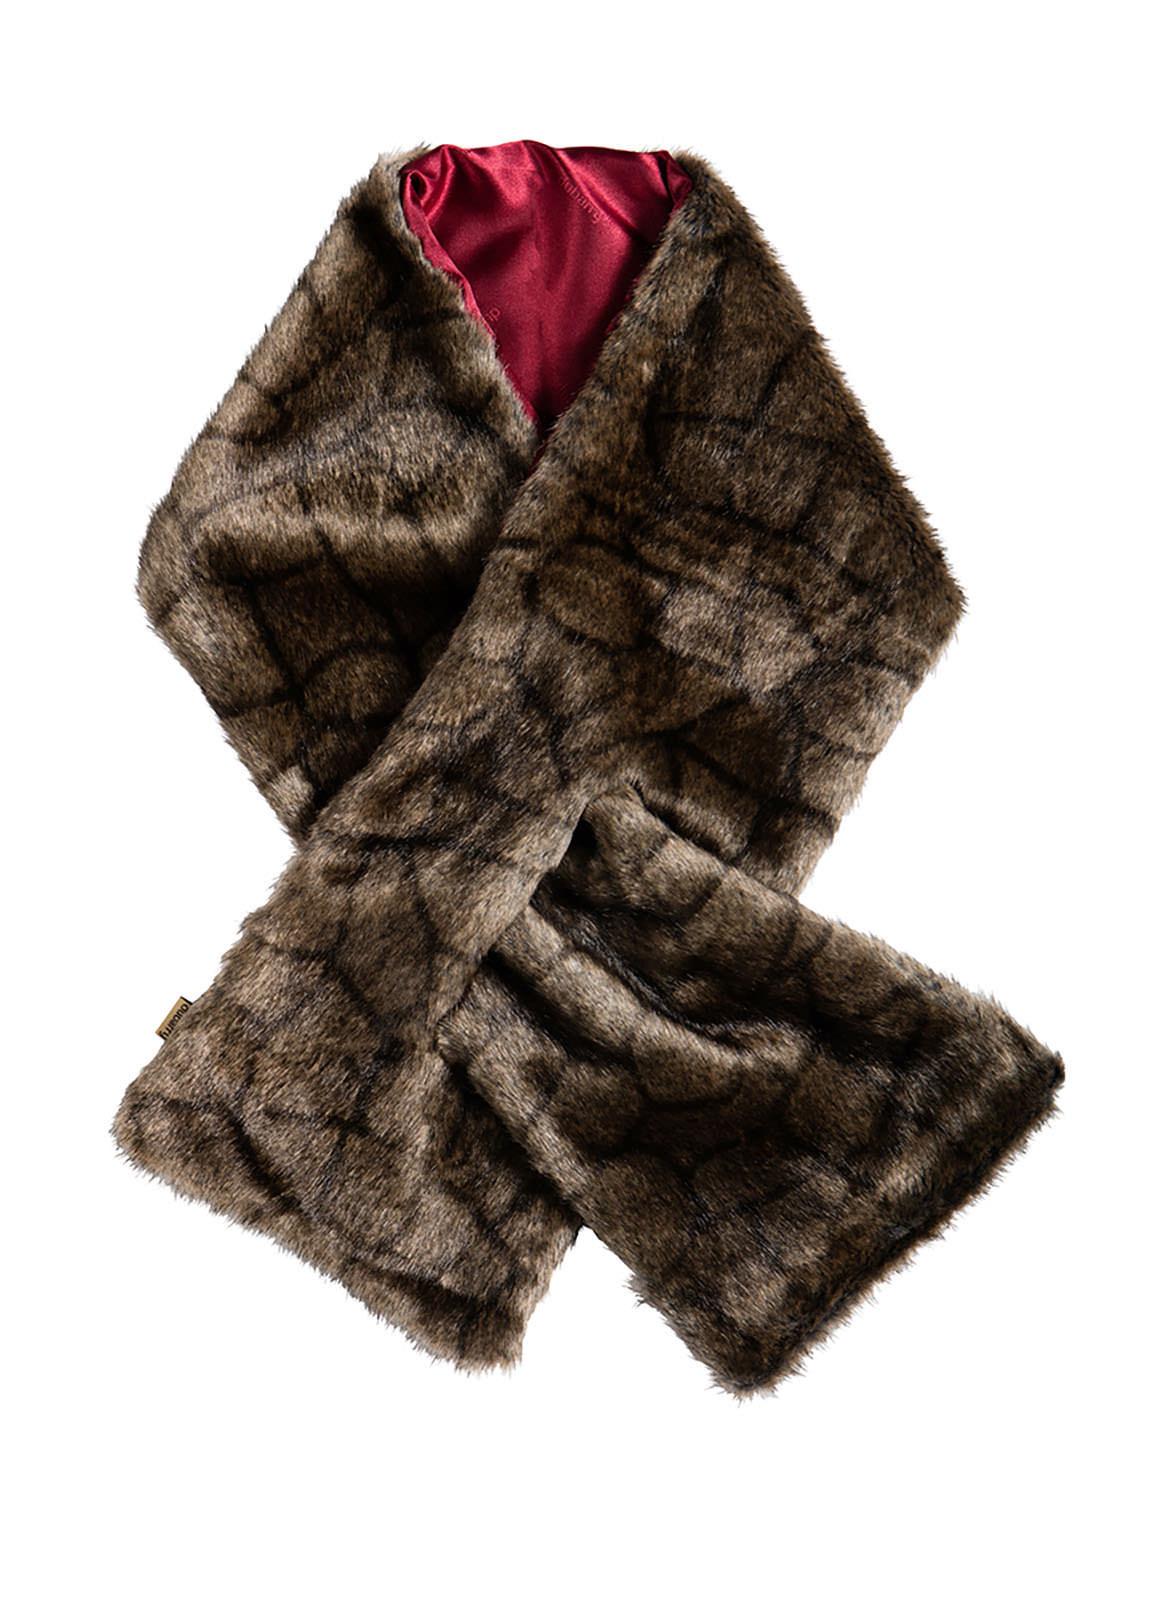 Altamont Faux Fur Wrap - Chinchilla